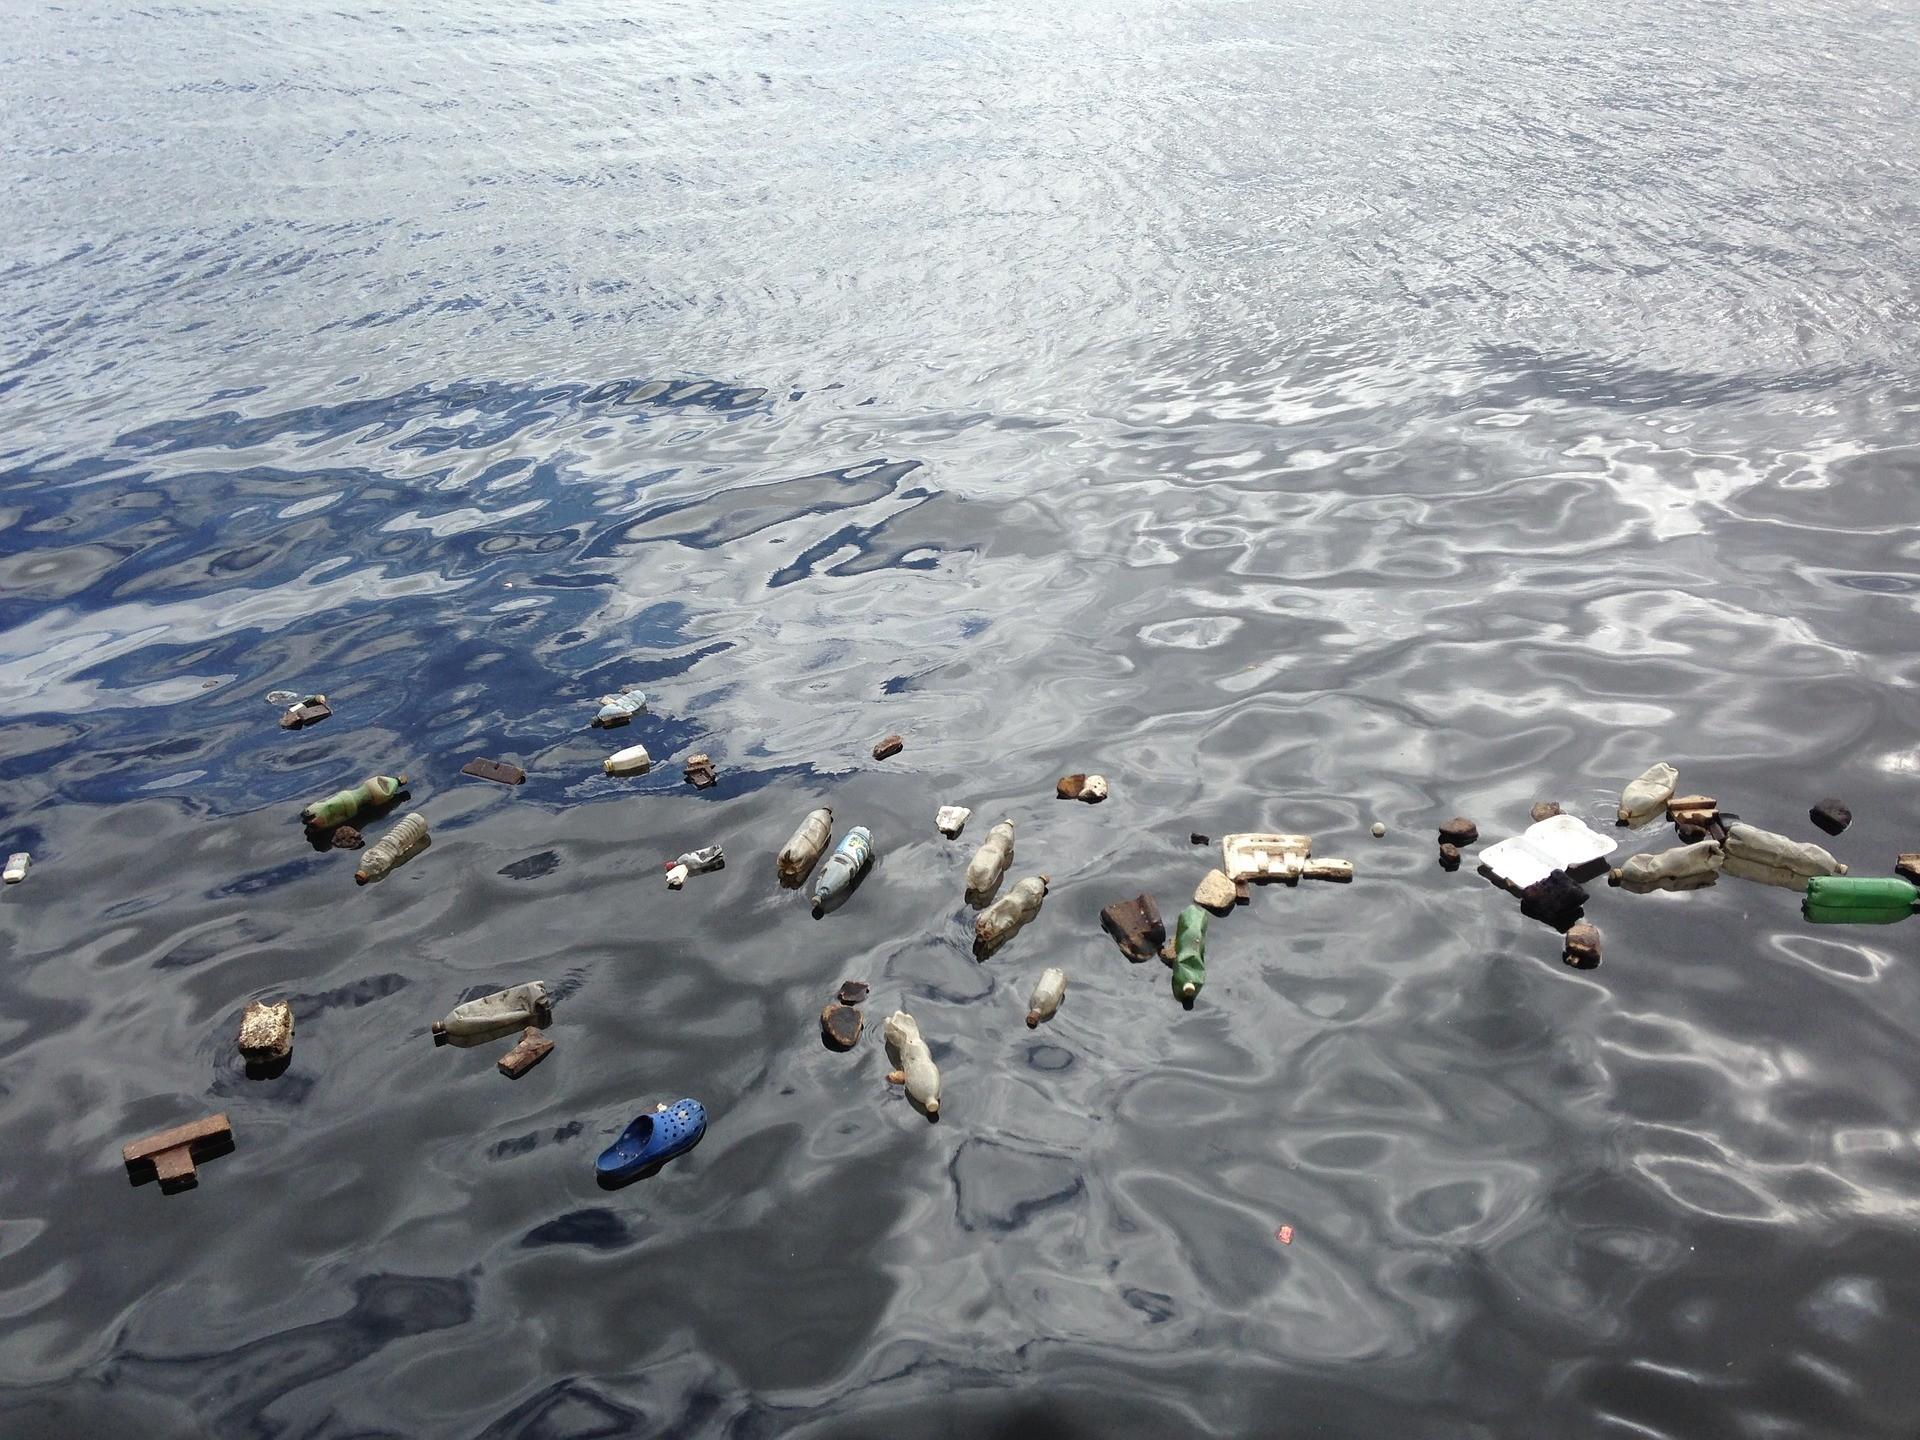 Image of plastic floating in the ocean